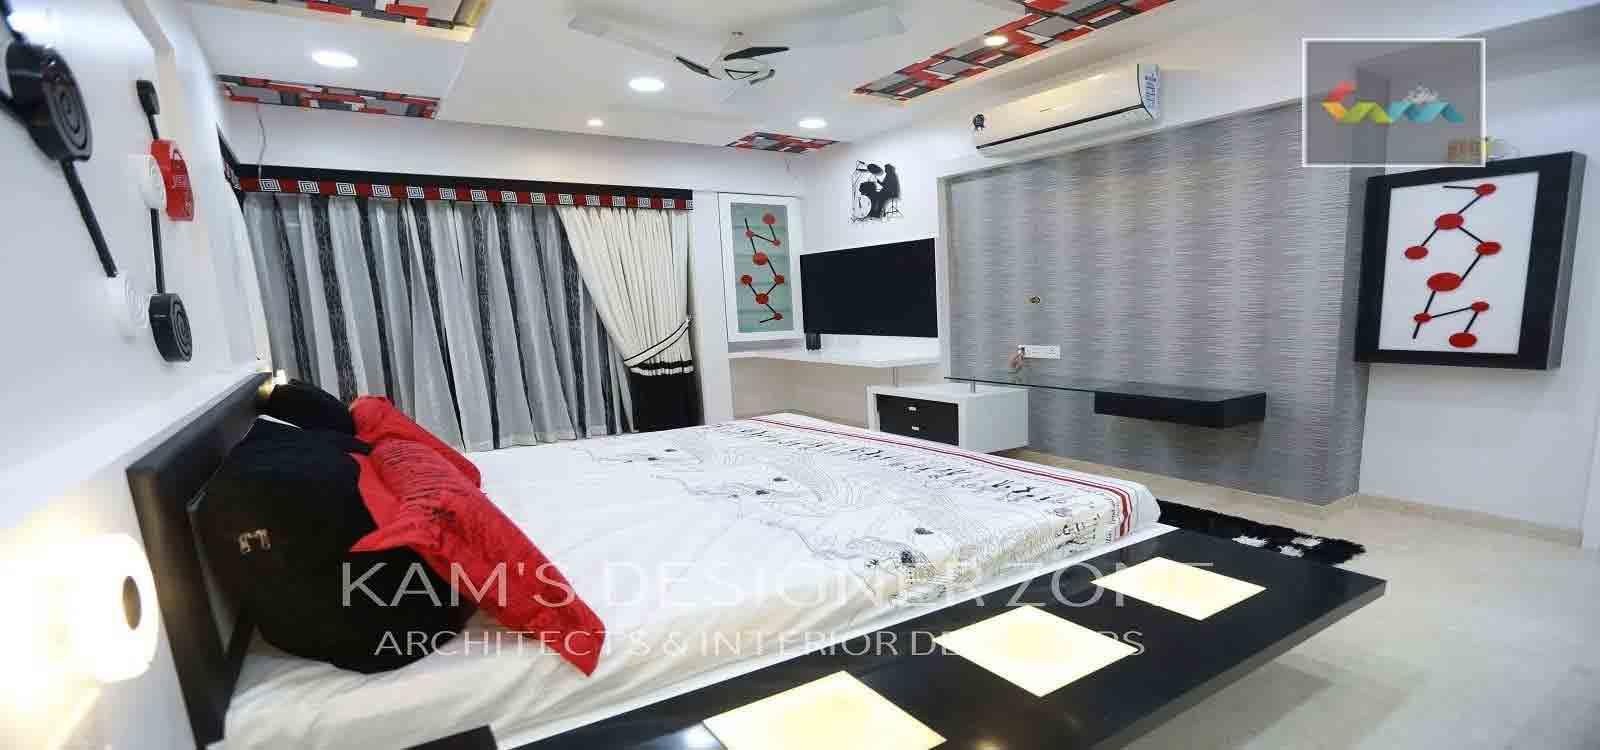 Interior Designers in Pune   Best Interior Designers for residence ...